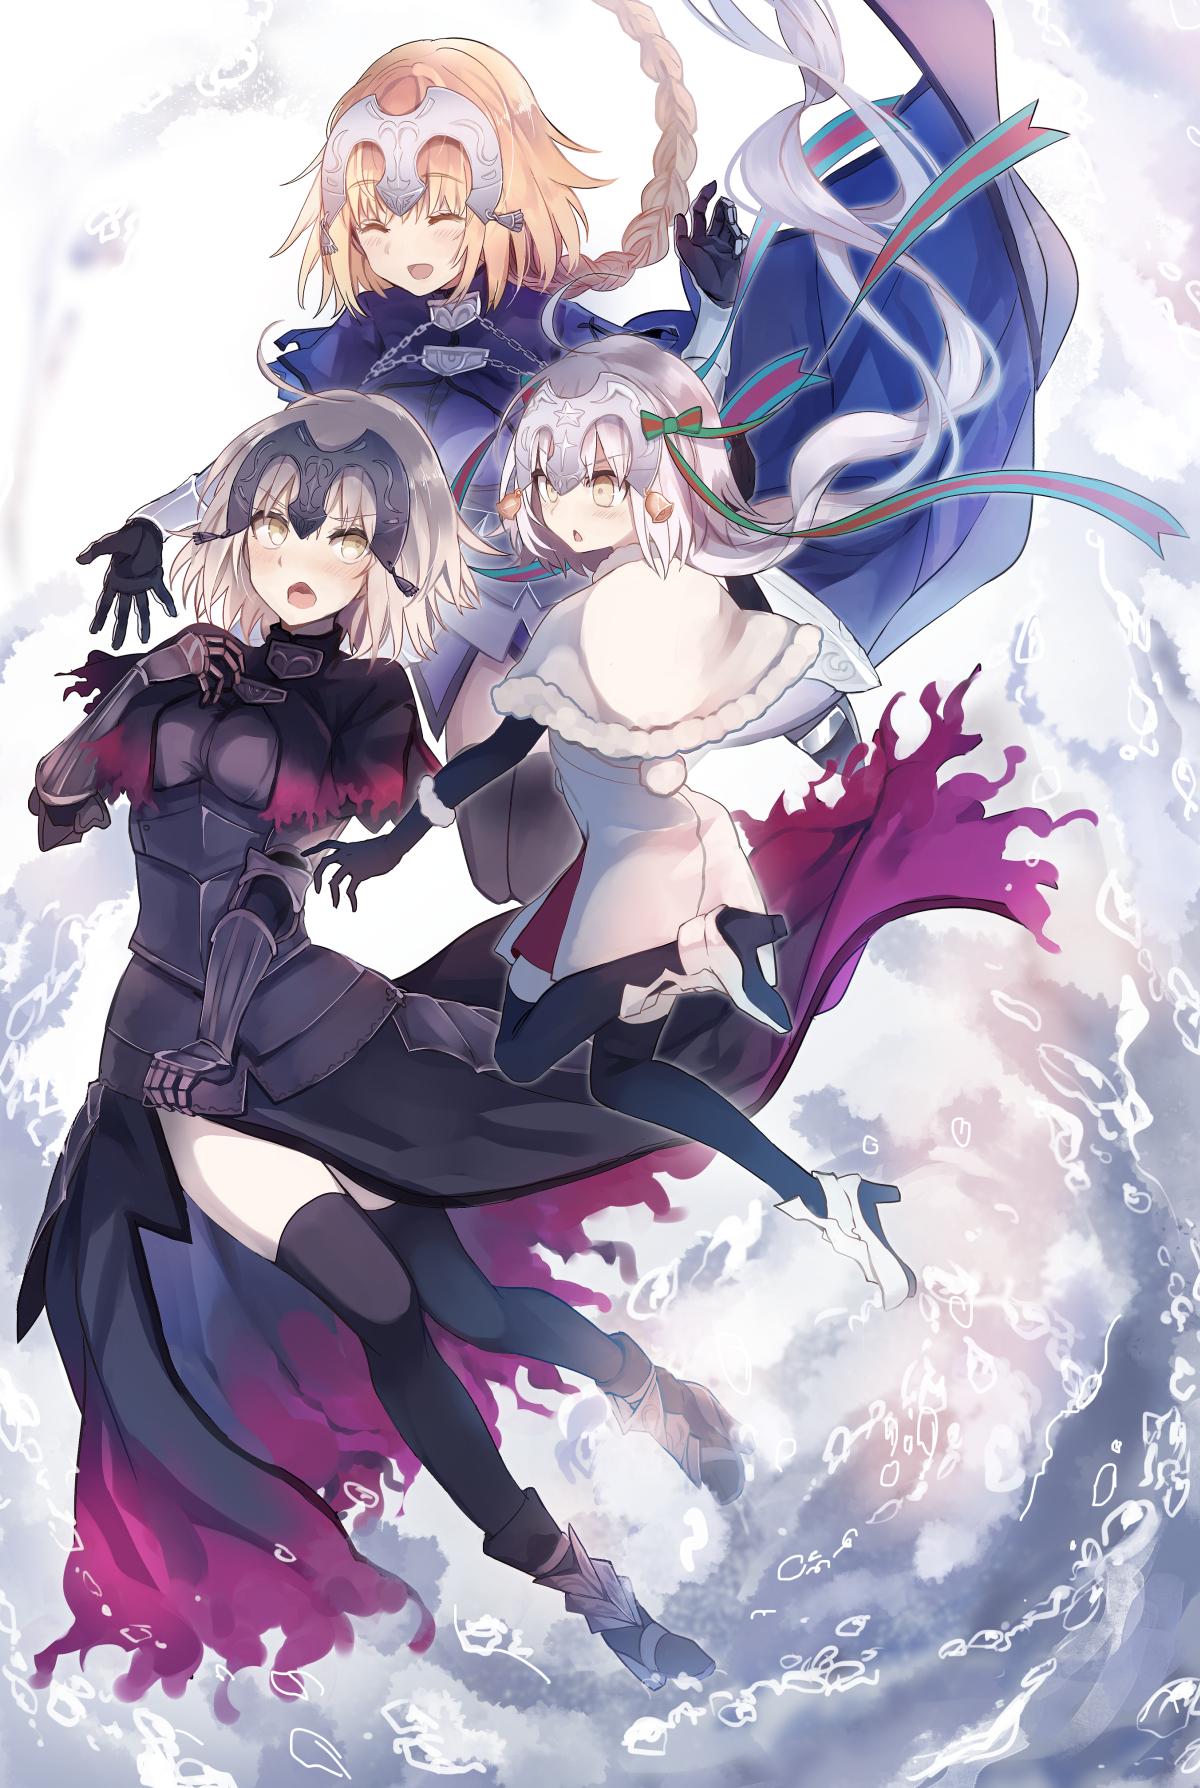 Fate Grand Order Mobile Wallpaper 2108002 Zerochan Anime Image